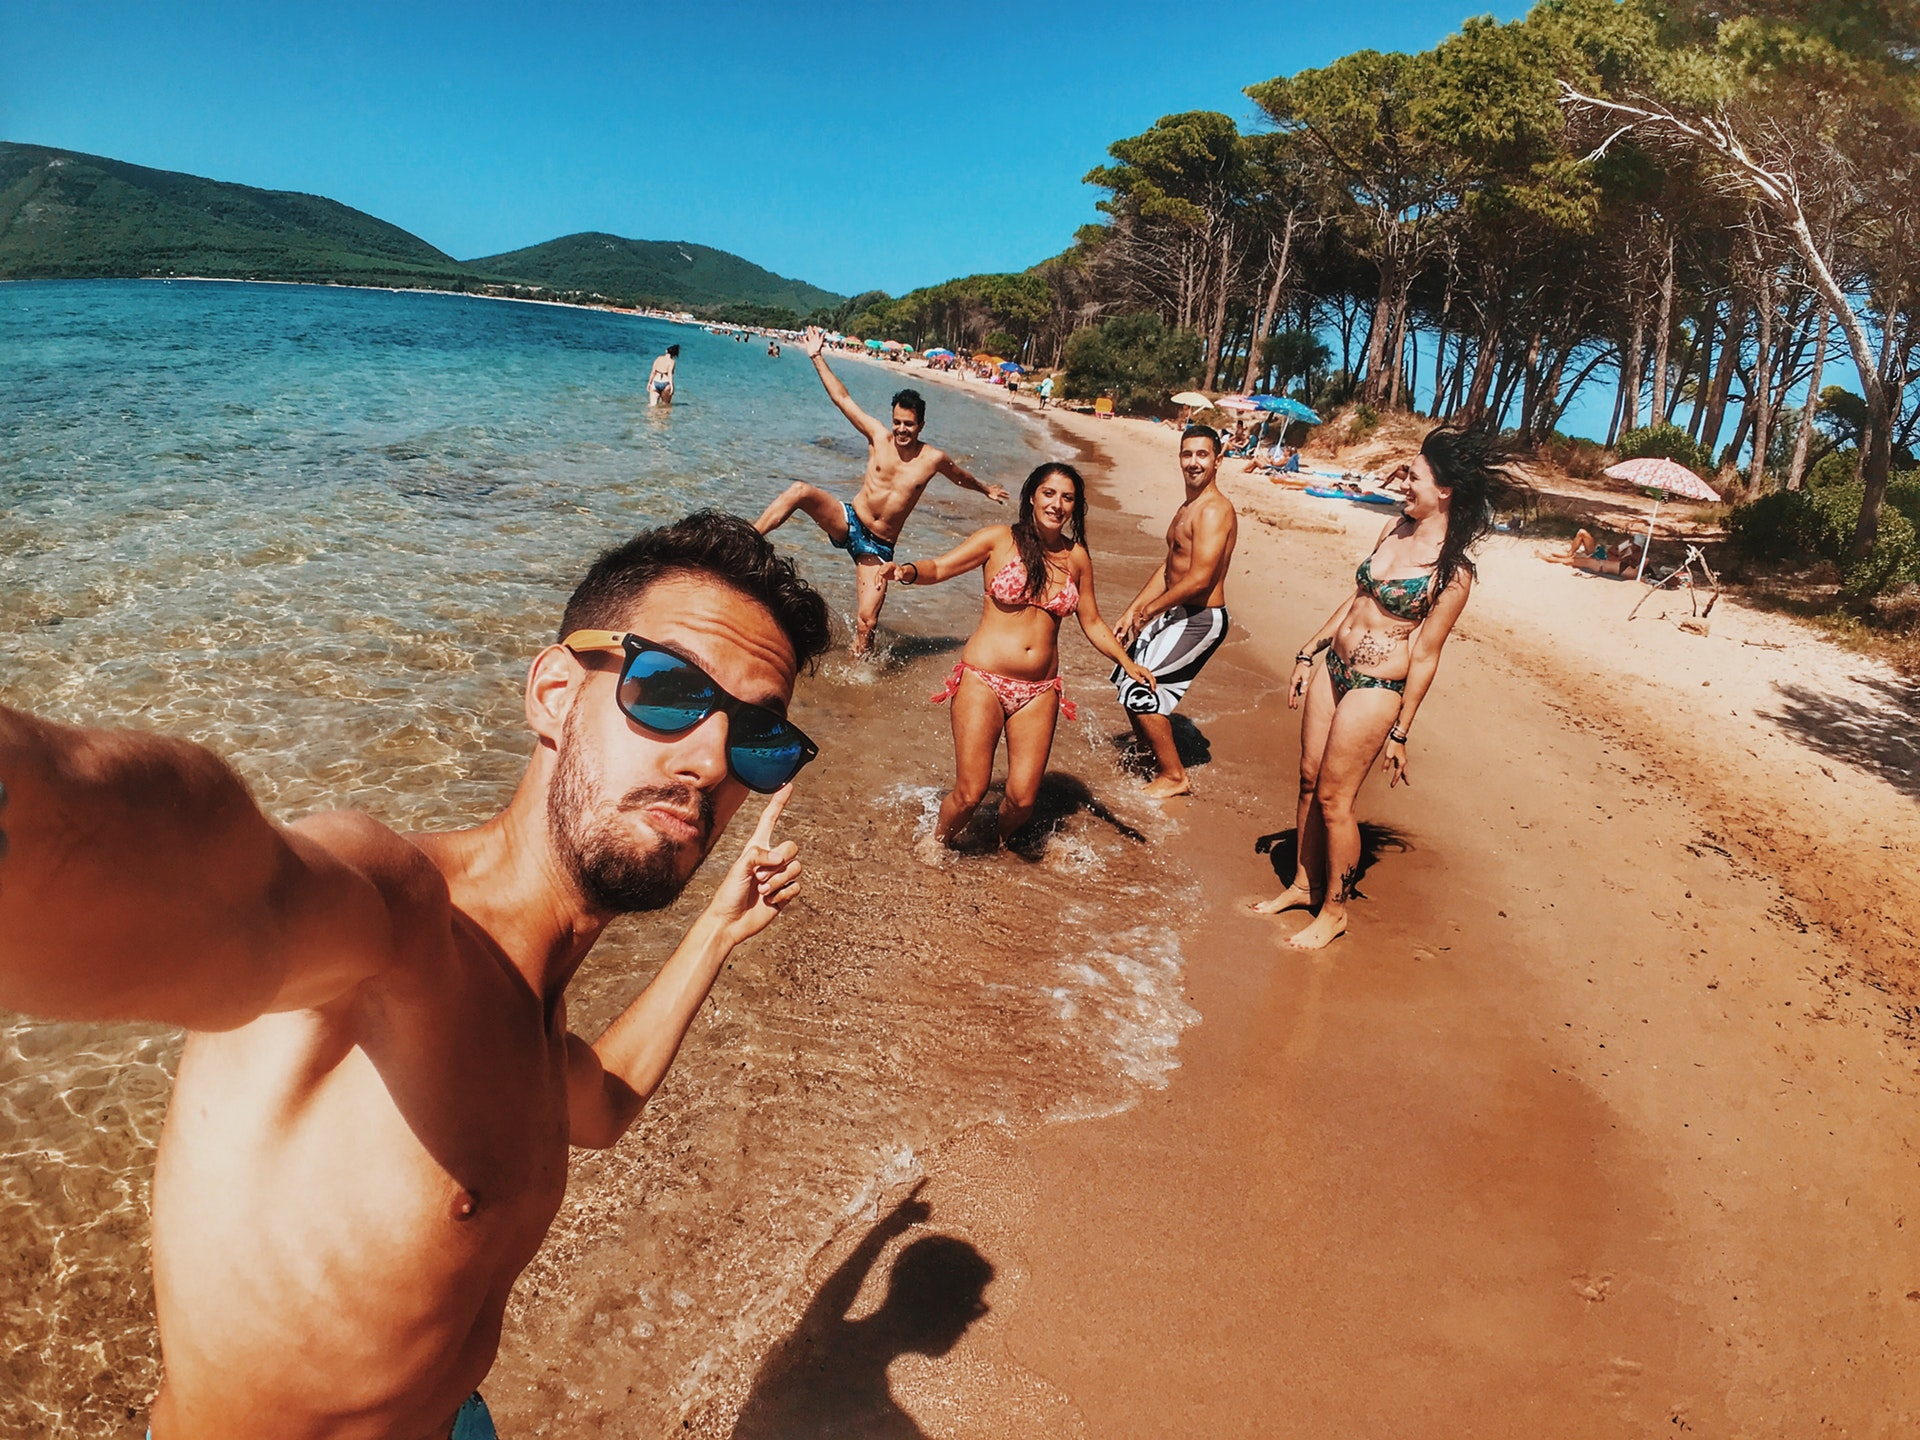 grupo en la playa